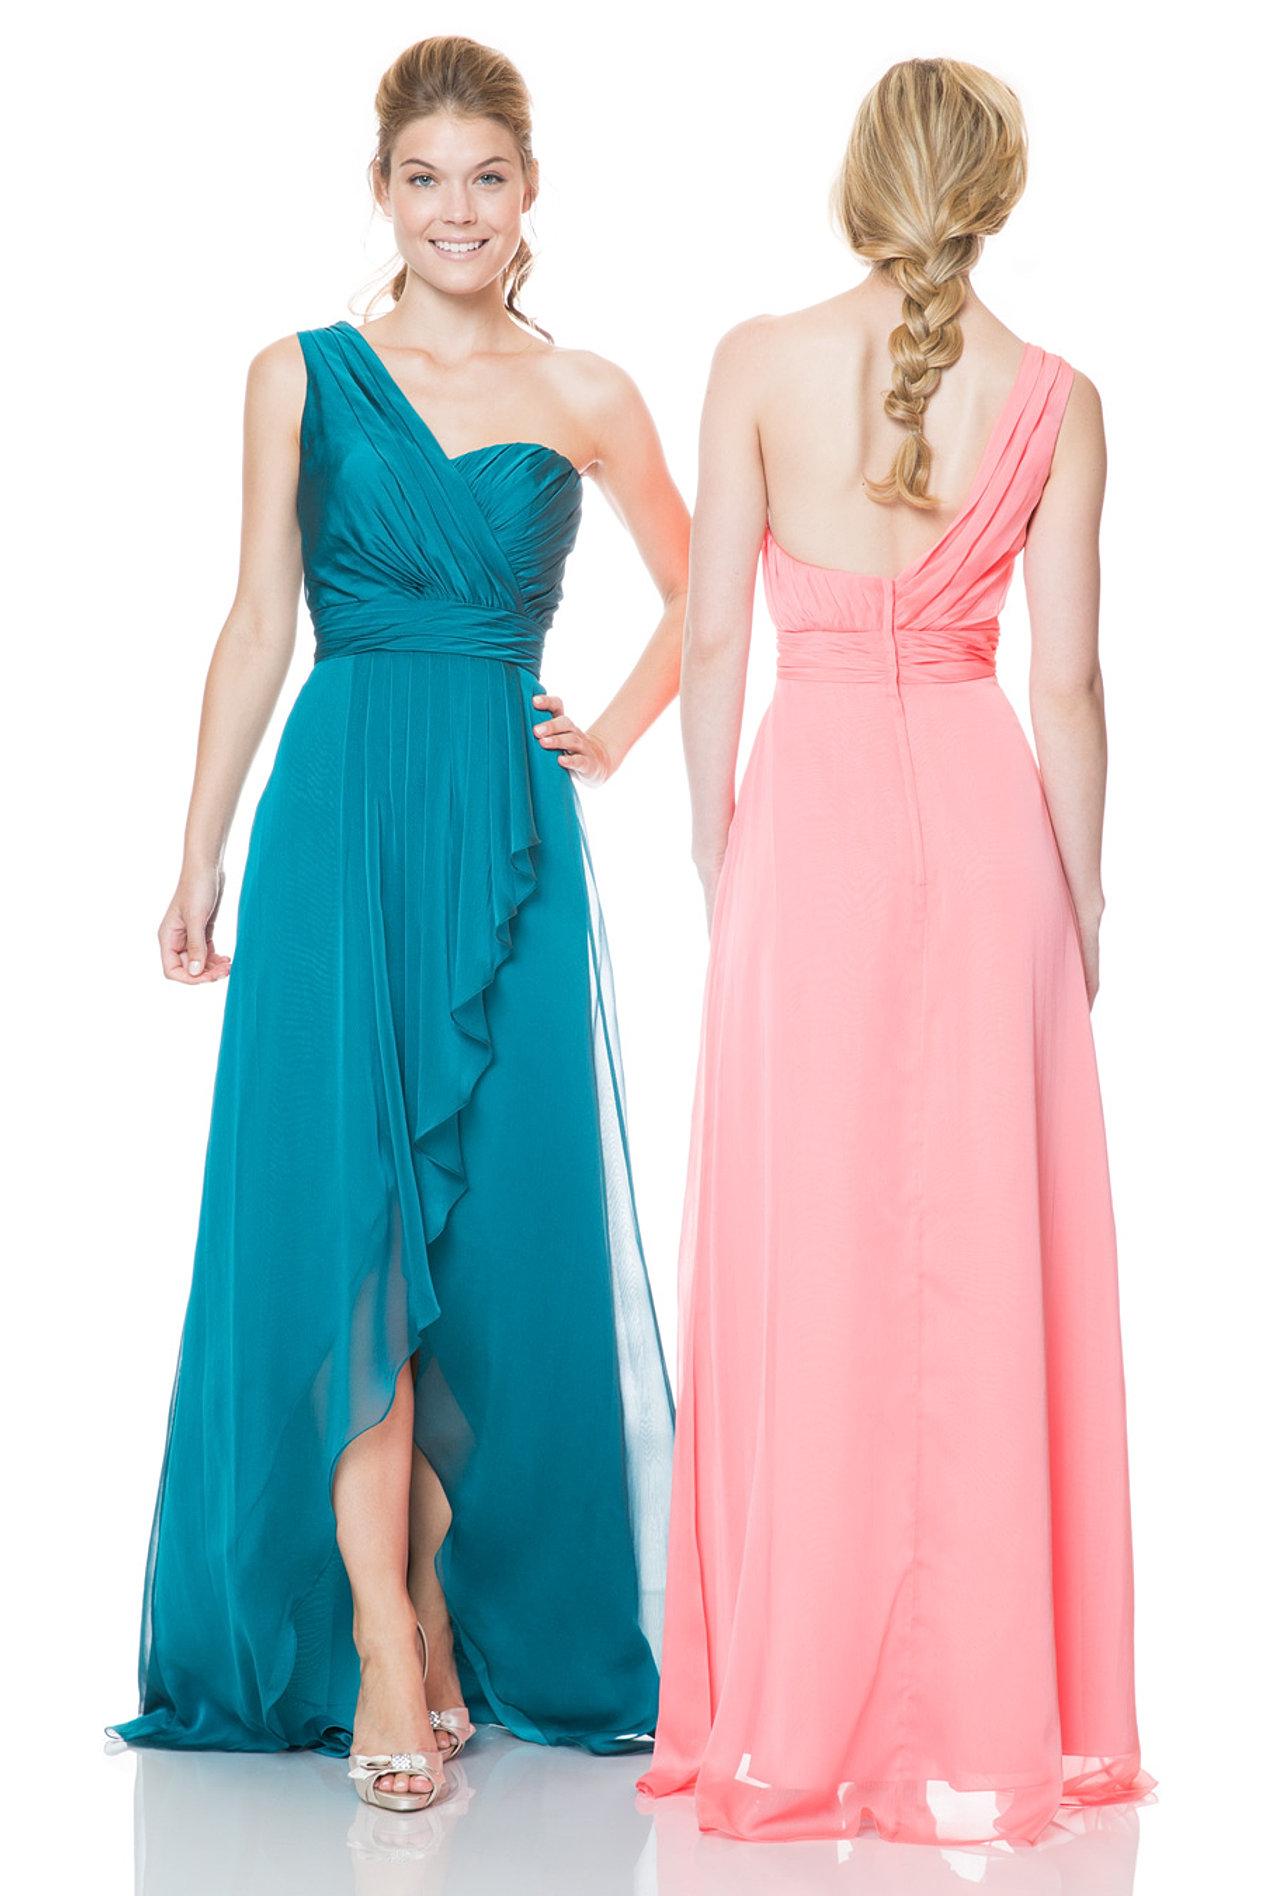 Hermosa Tlc Say Yes To The Dress Bridesmaids Adorno - Colección de ...